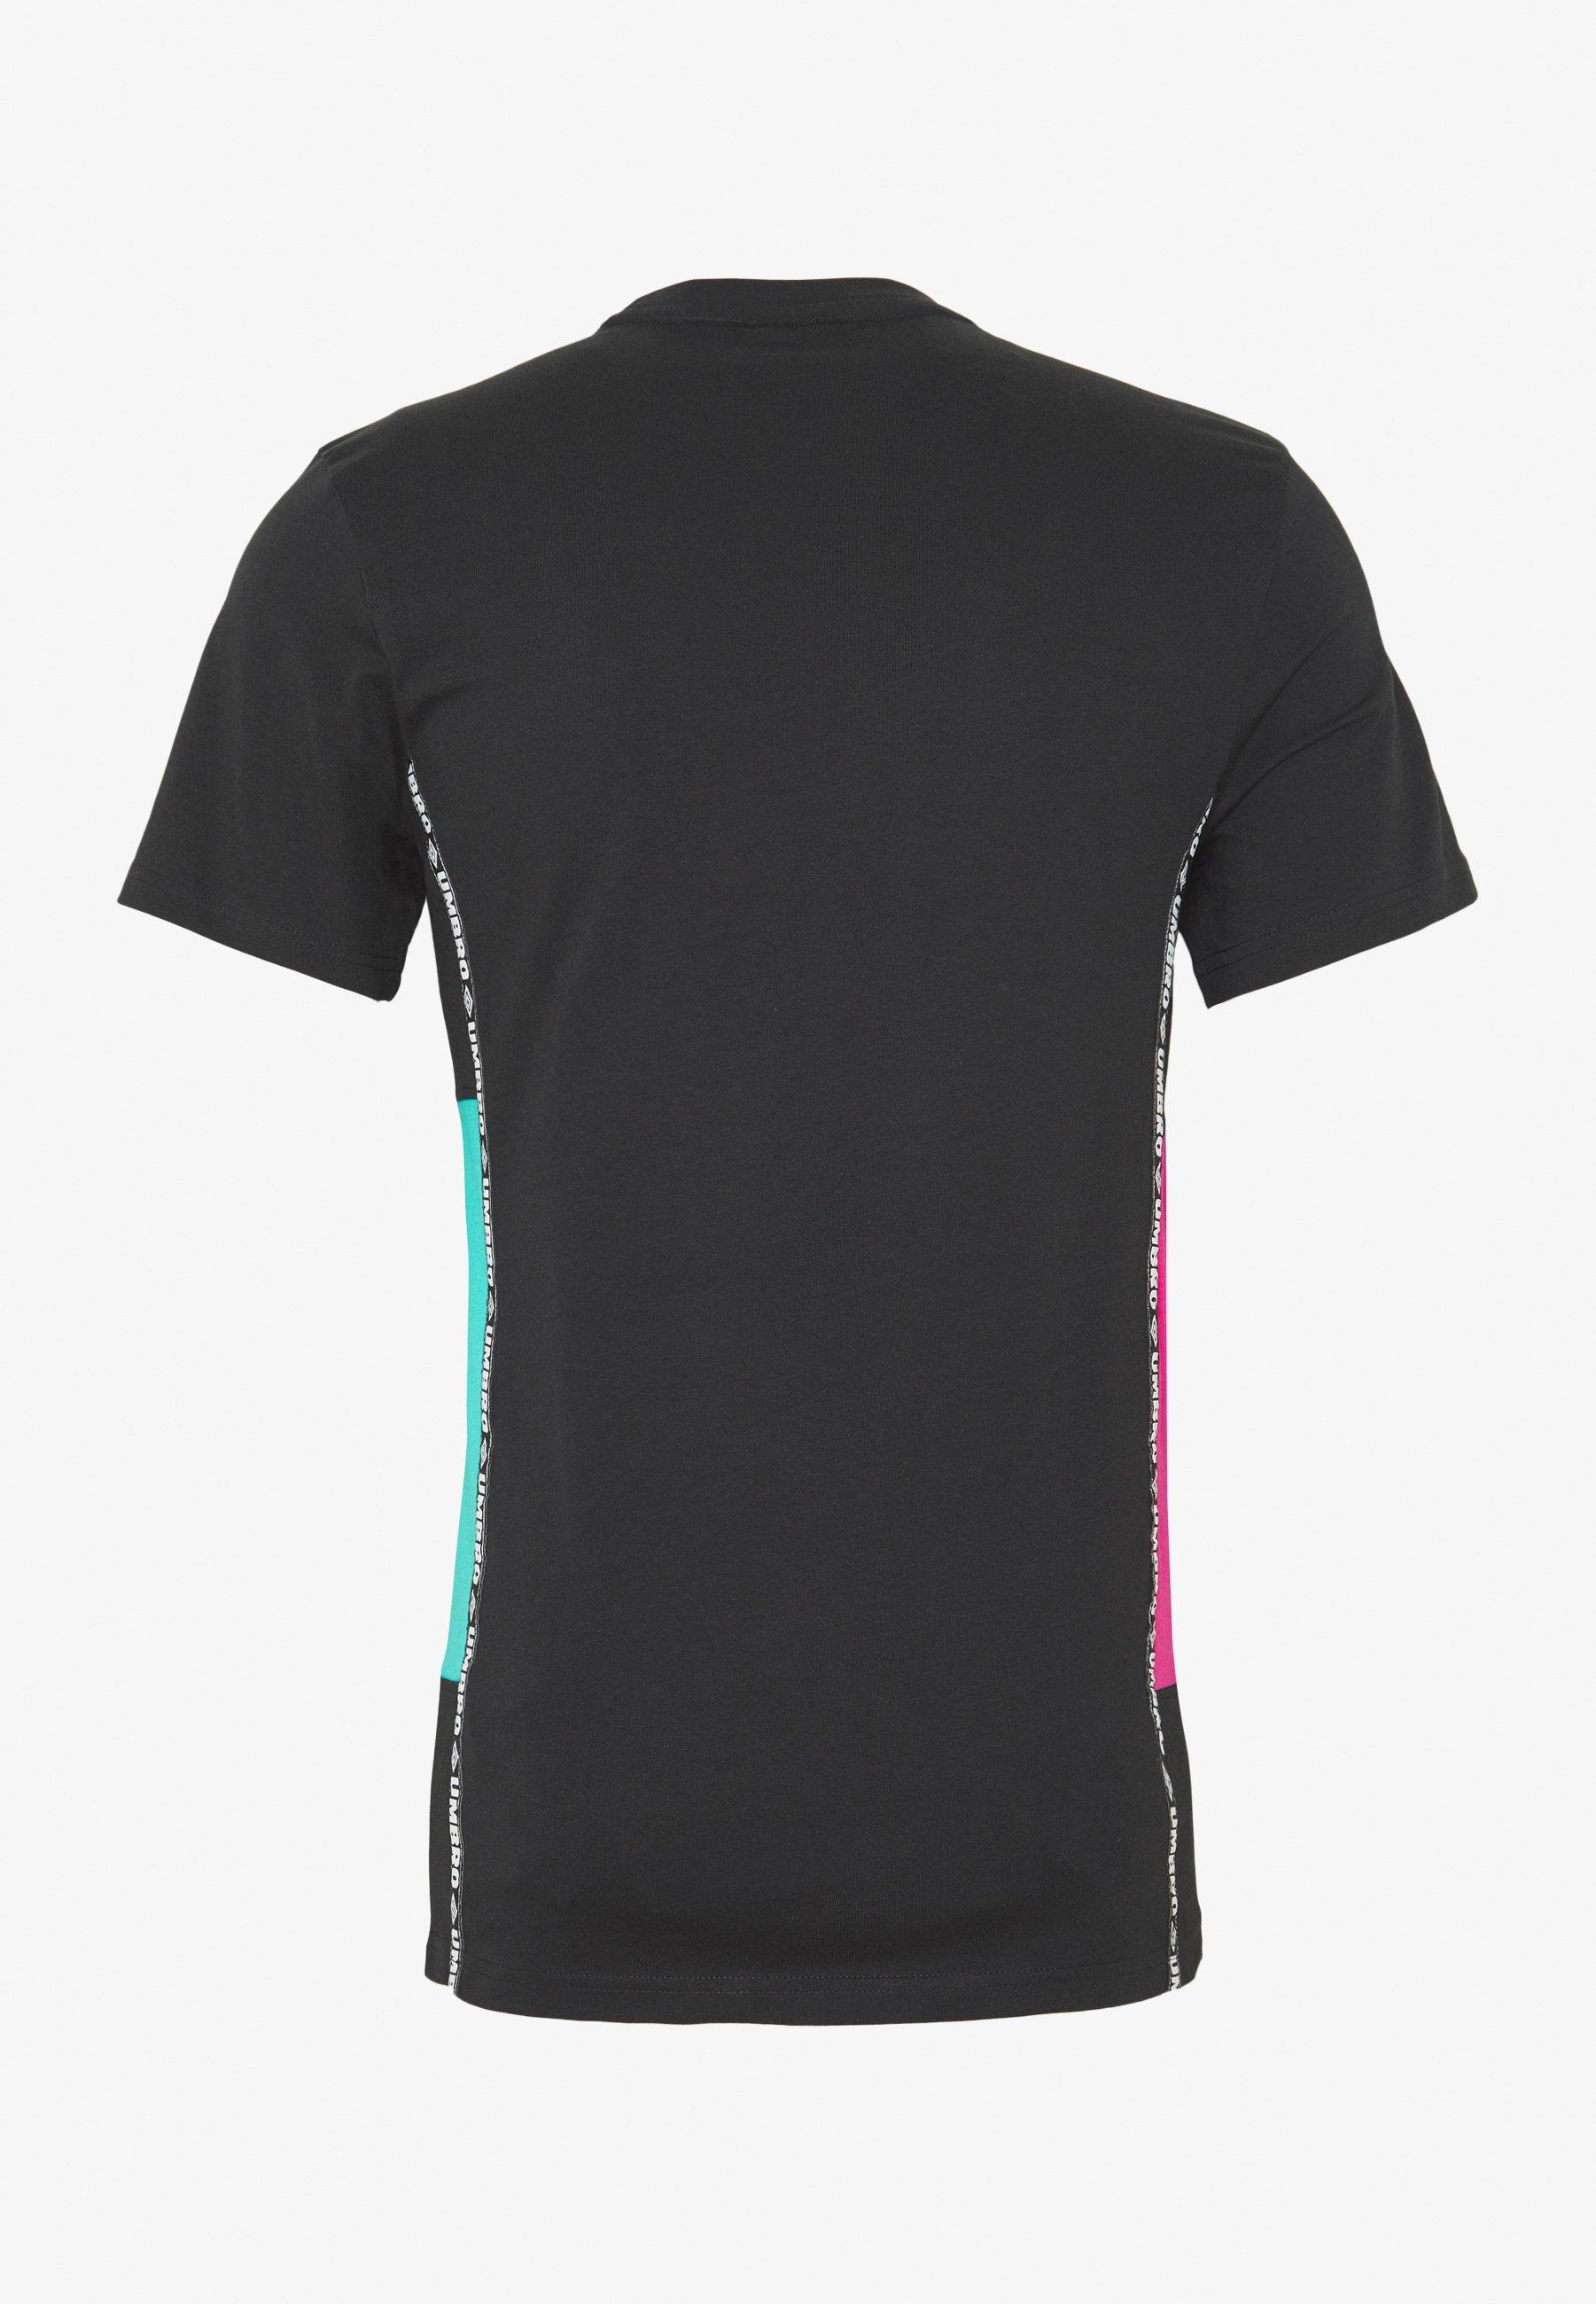 Umbro Projects Horizon Crew Tee - T-shirt Med Print Ceramic/deep Surf/black wvjyxzK